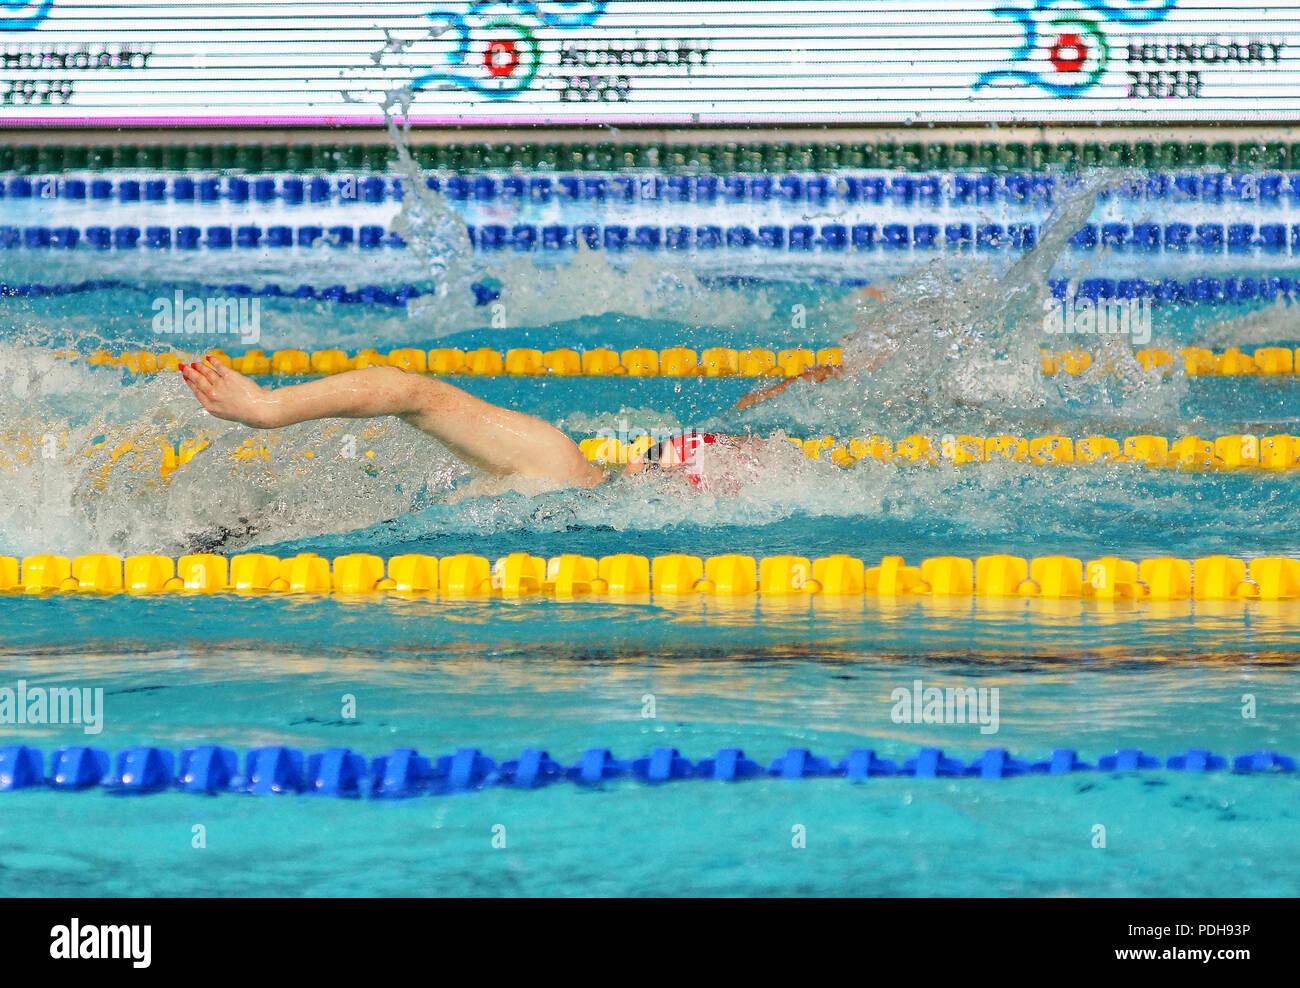 Glasgow, UK : 9th August 2018 - GBR 4x100m Medley Relay Womans team gets bronze medal on European Championships 2018 after heroic battle. Credit: Pawel Pietraszewski / Alamy Live News - Stock Image